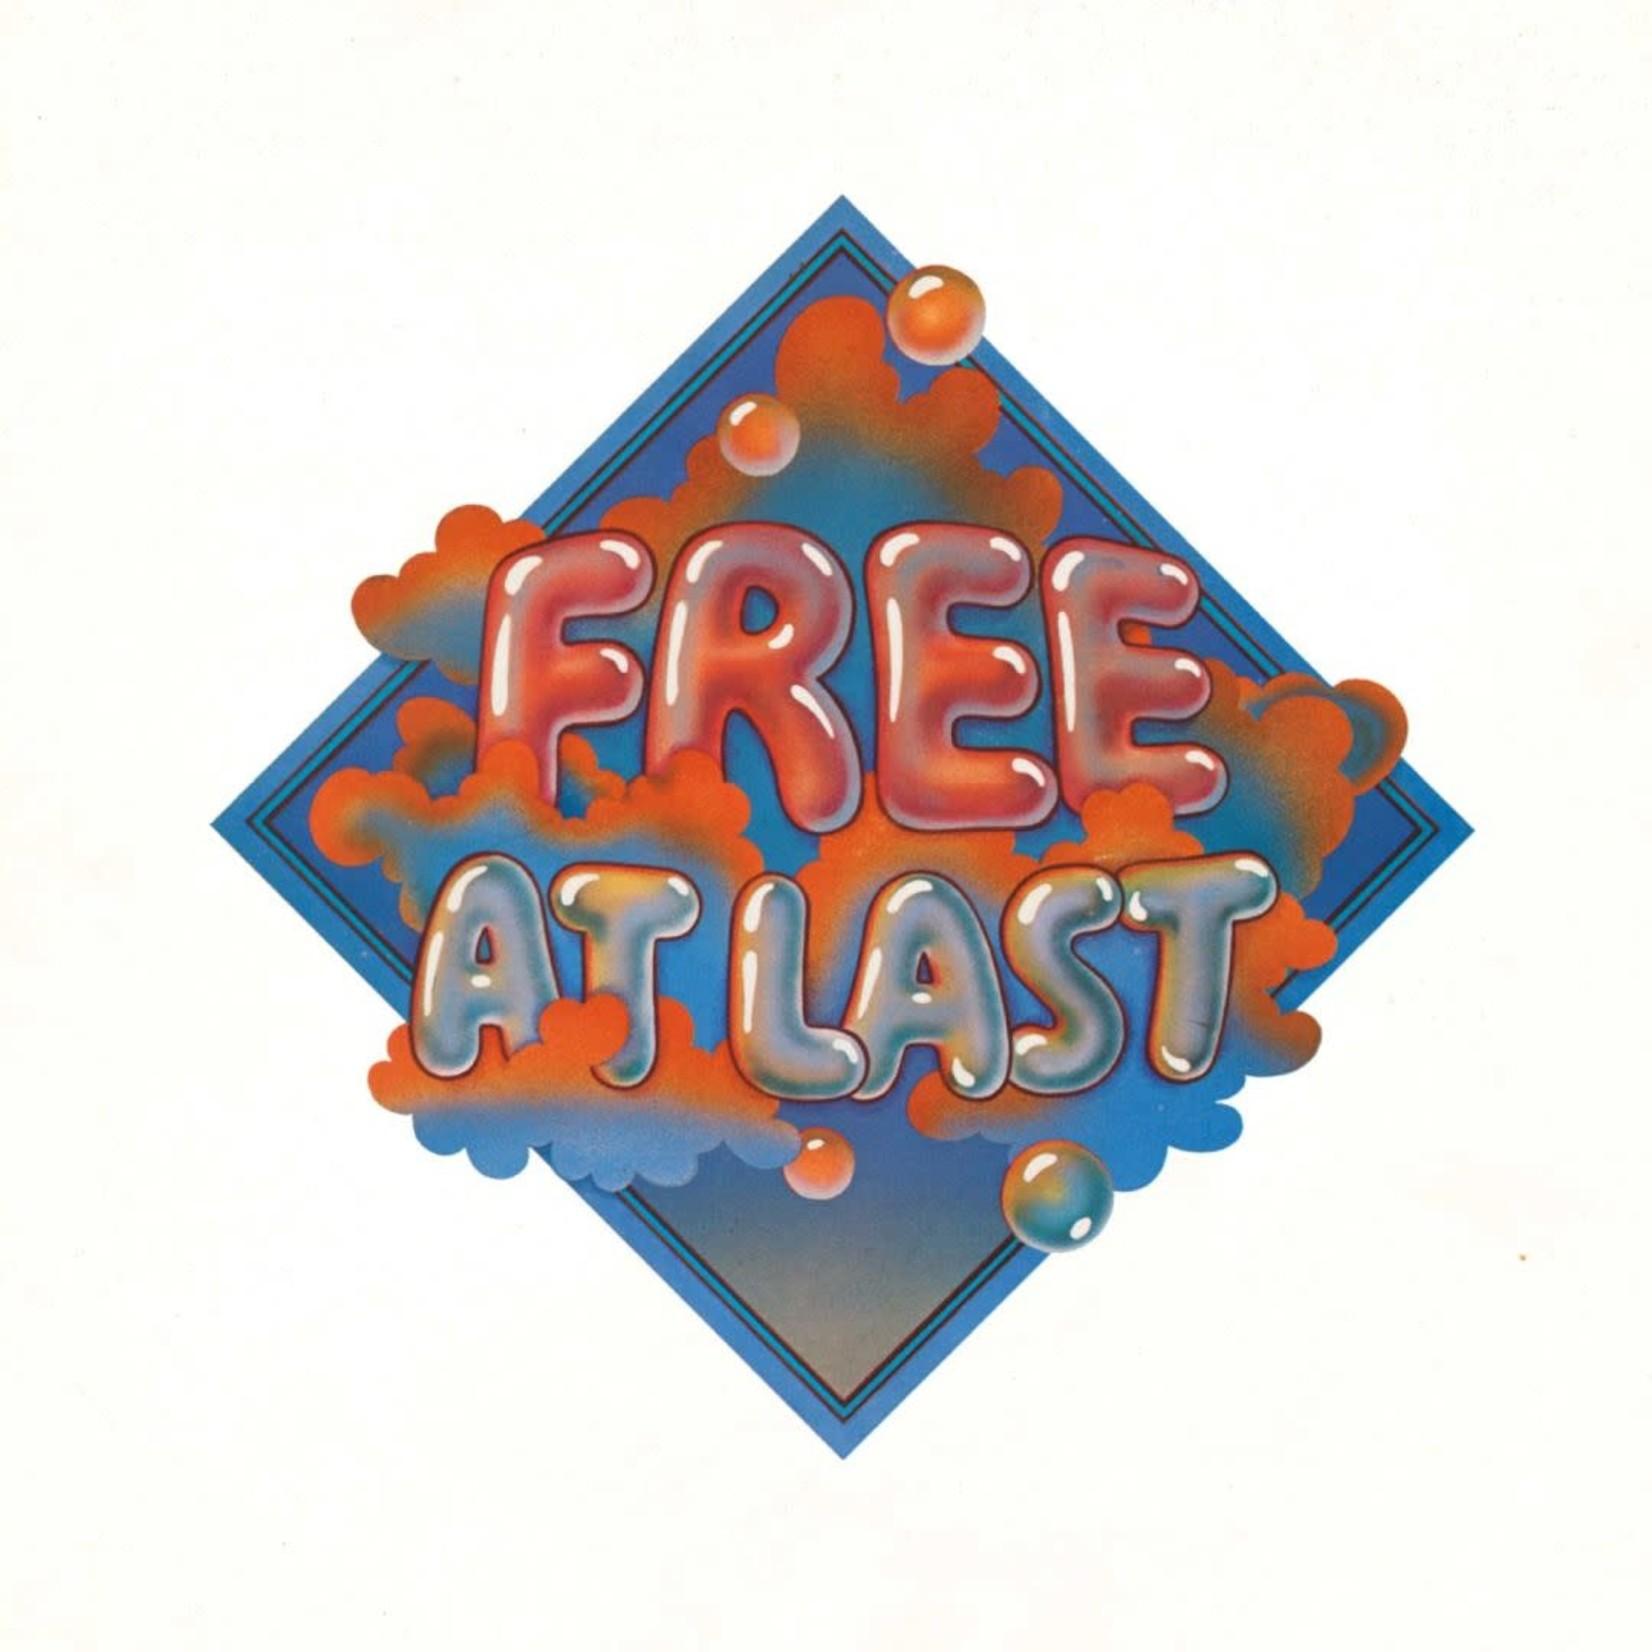 Vinyl Free - At Last.  Final Sale